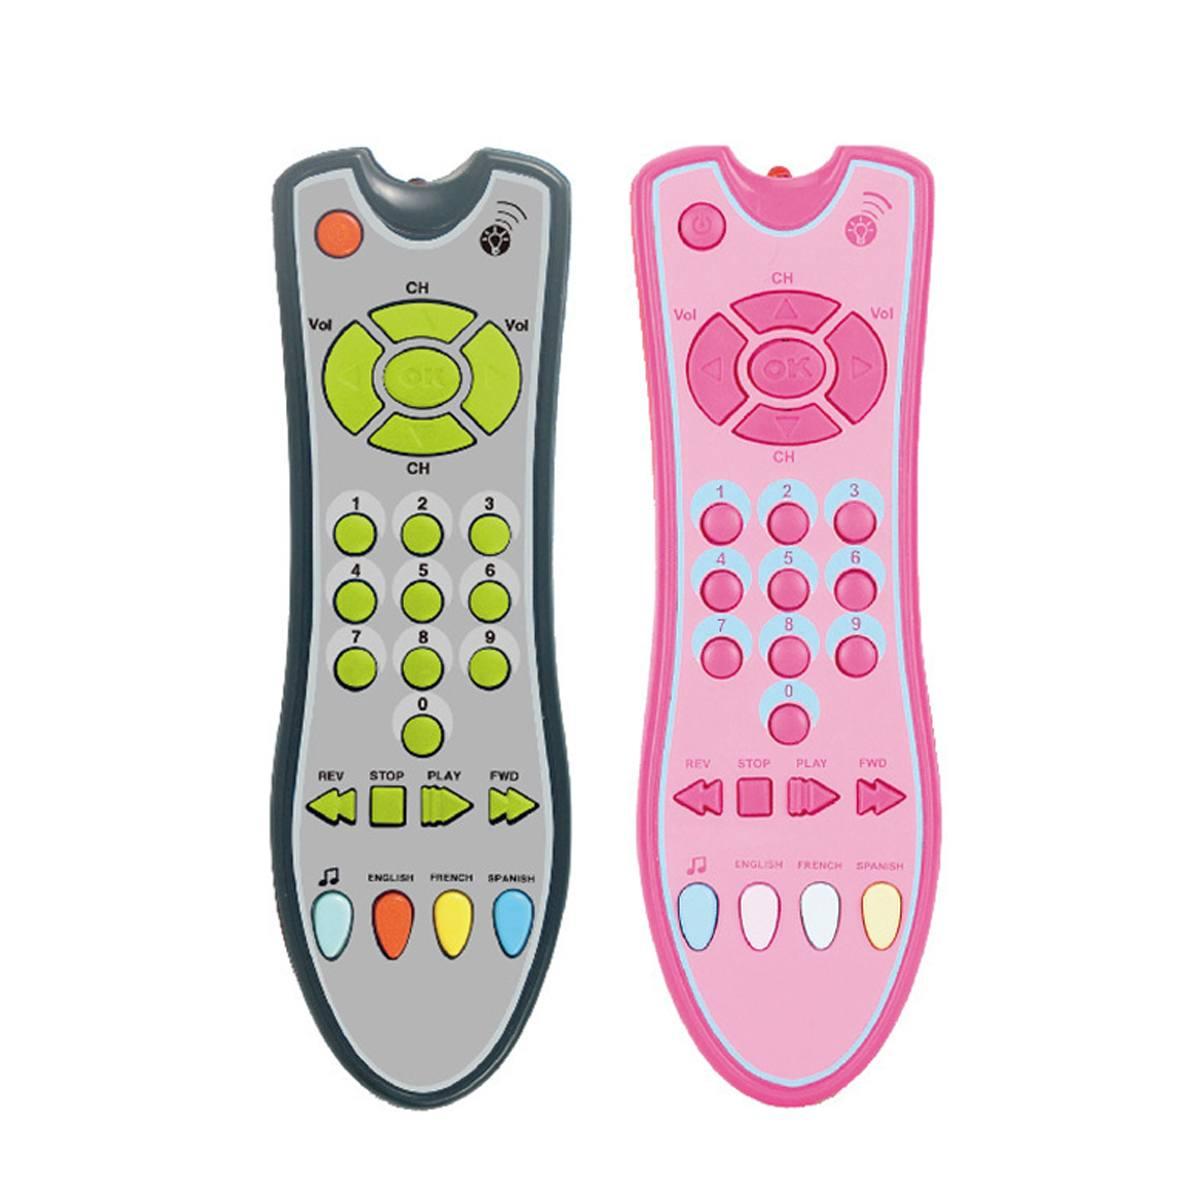 Control remoto del bebé juguete de aprendizaje de luz de música remoto para bebé clic conteo de juguetes remotos para niño niña niño juguete